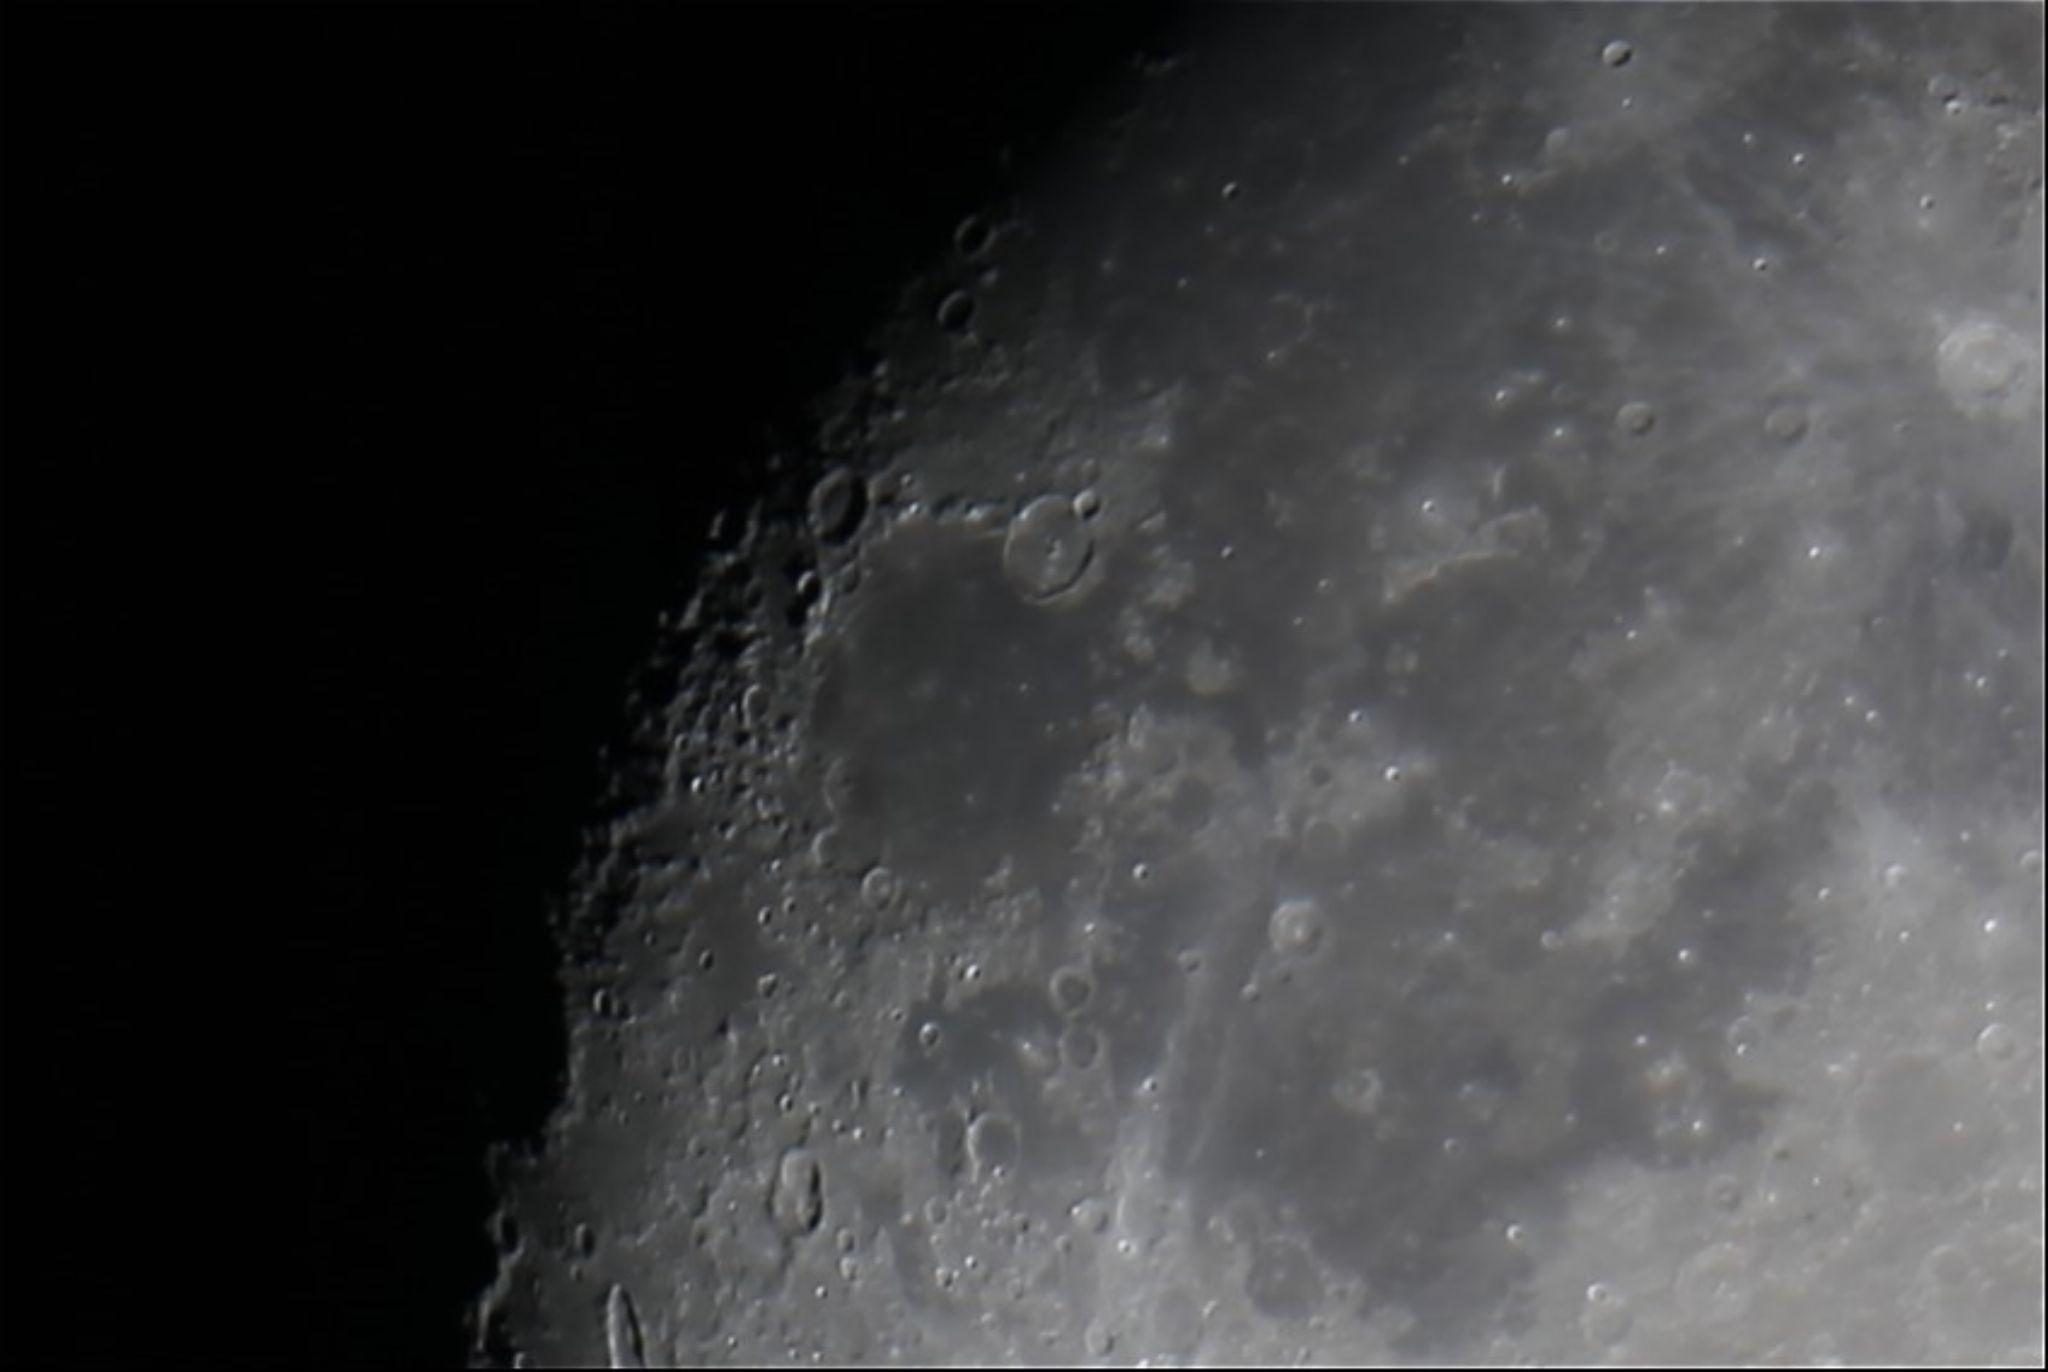 Moon on 9-5-14 by matthew.moseman